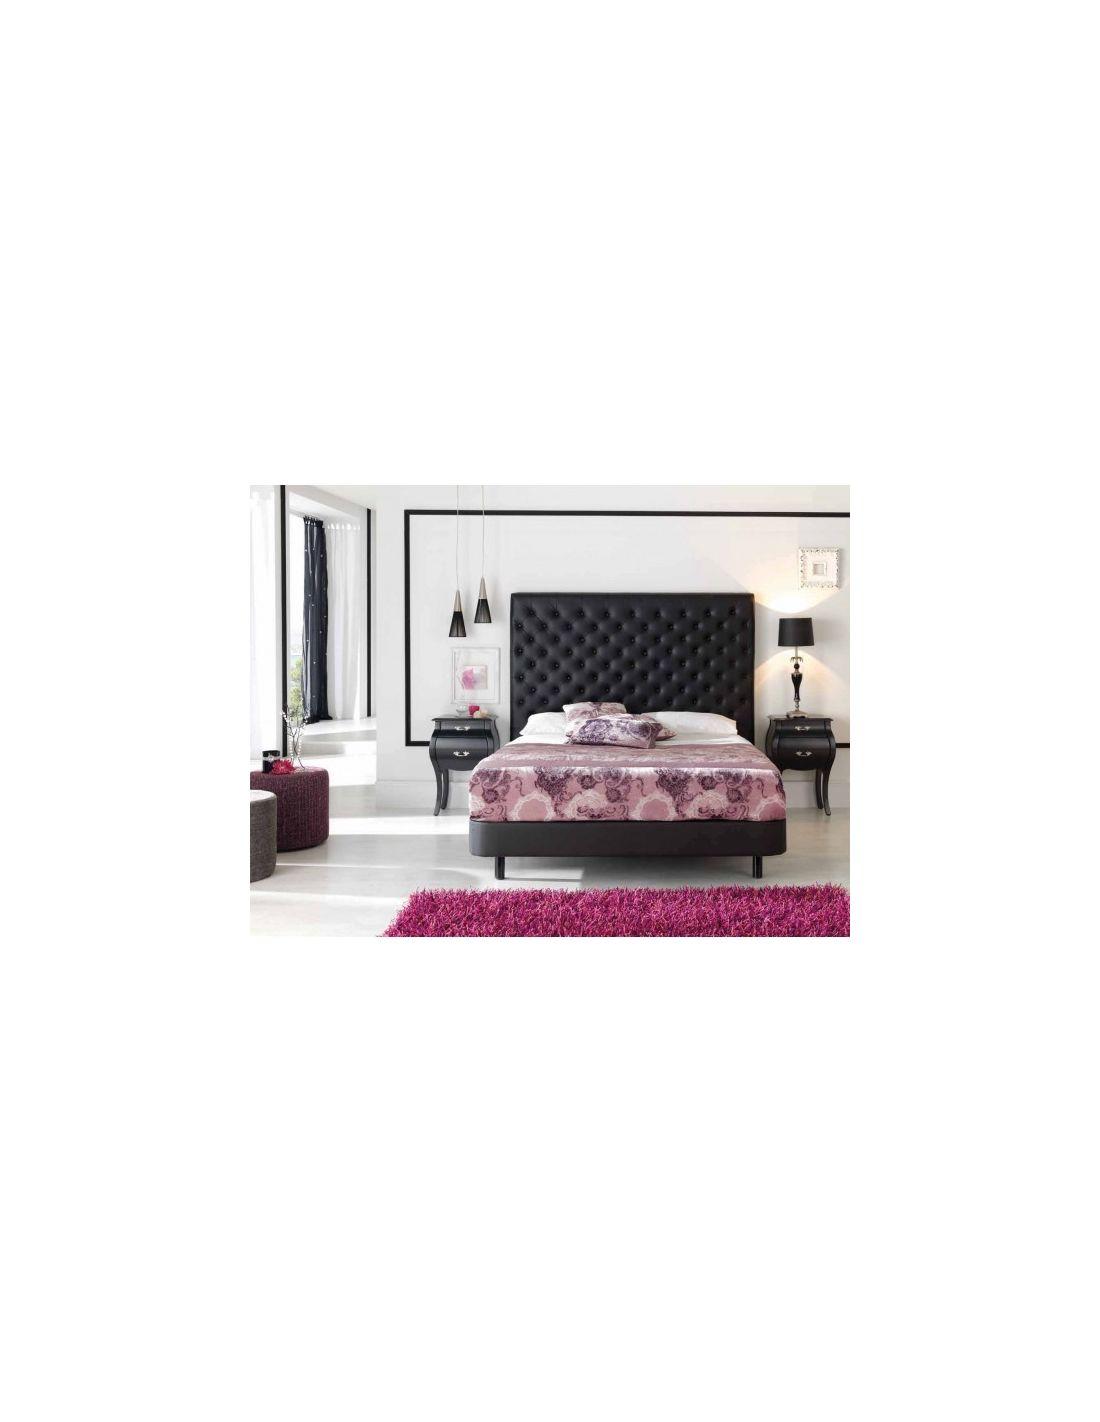 Matrimonio Box Bed : Cabeceros polipiel piel tapizados